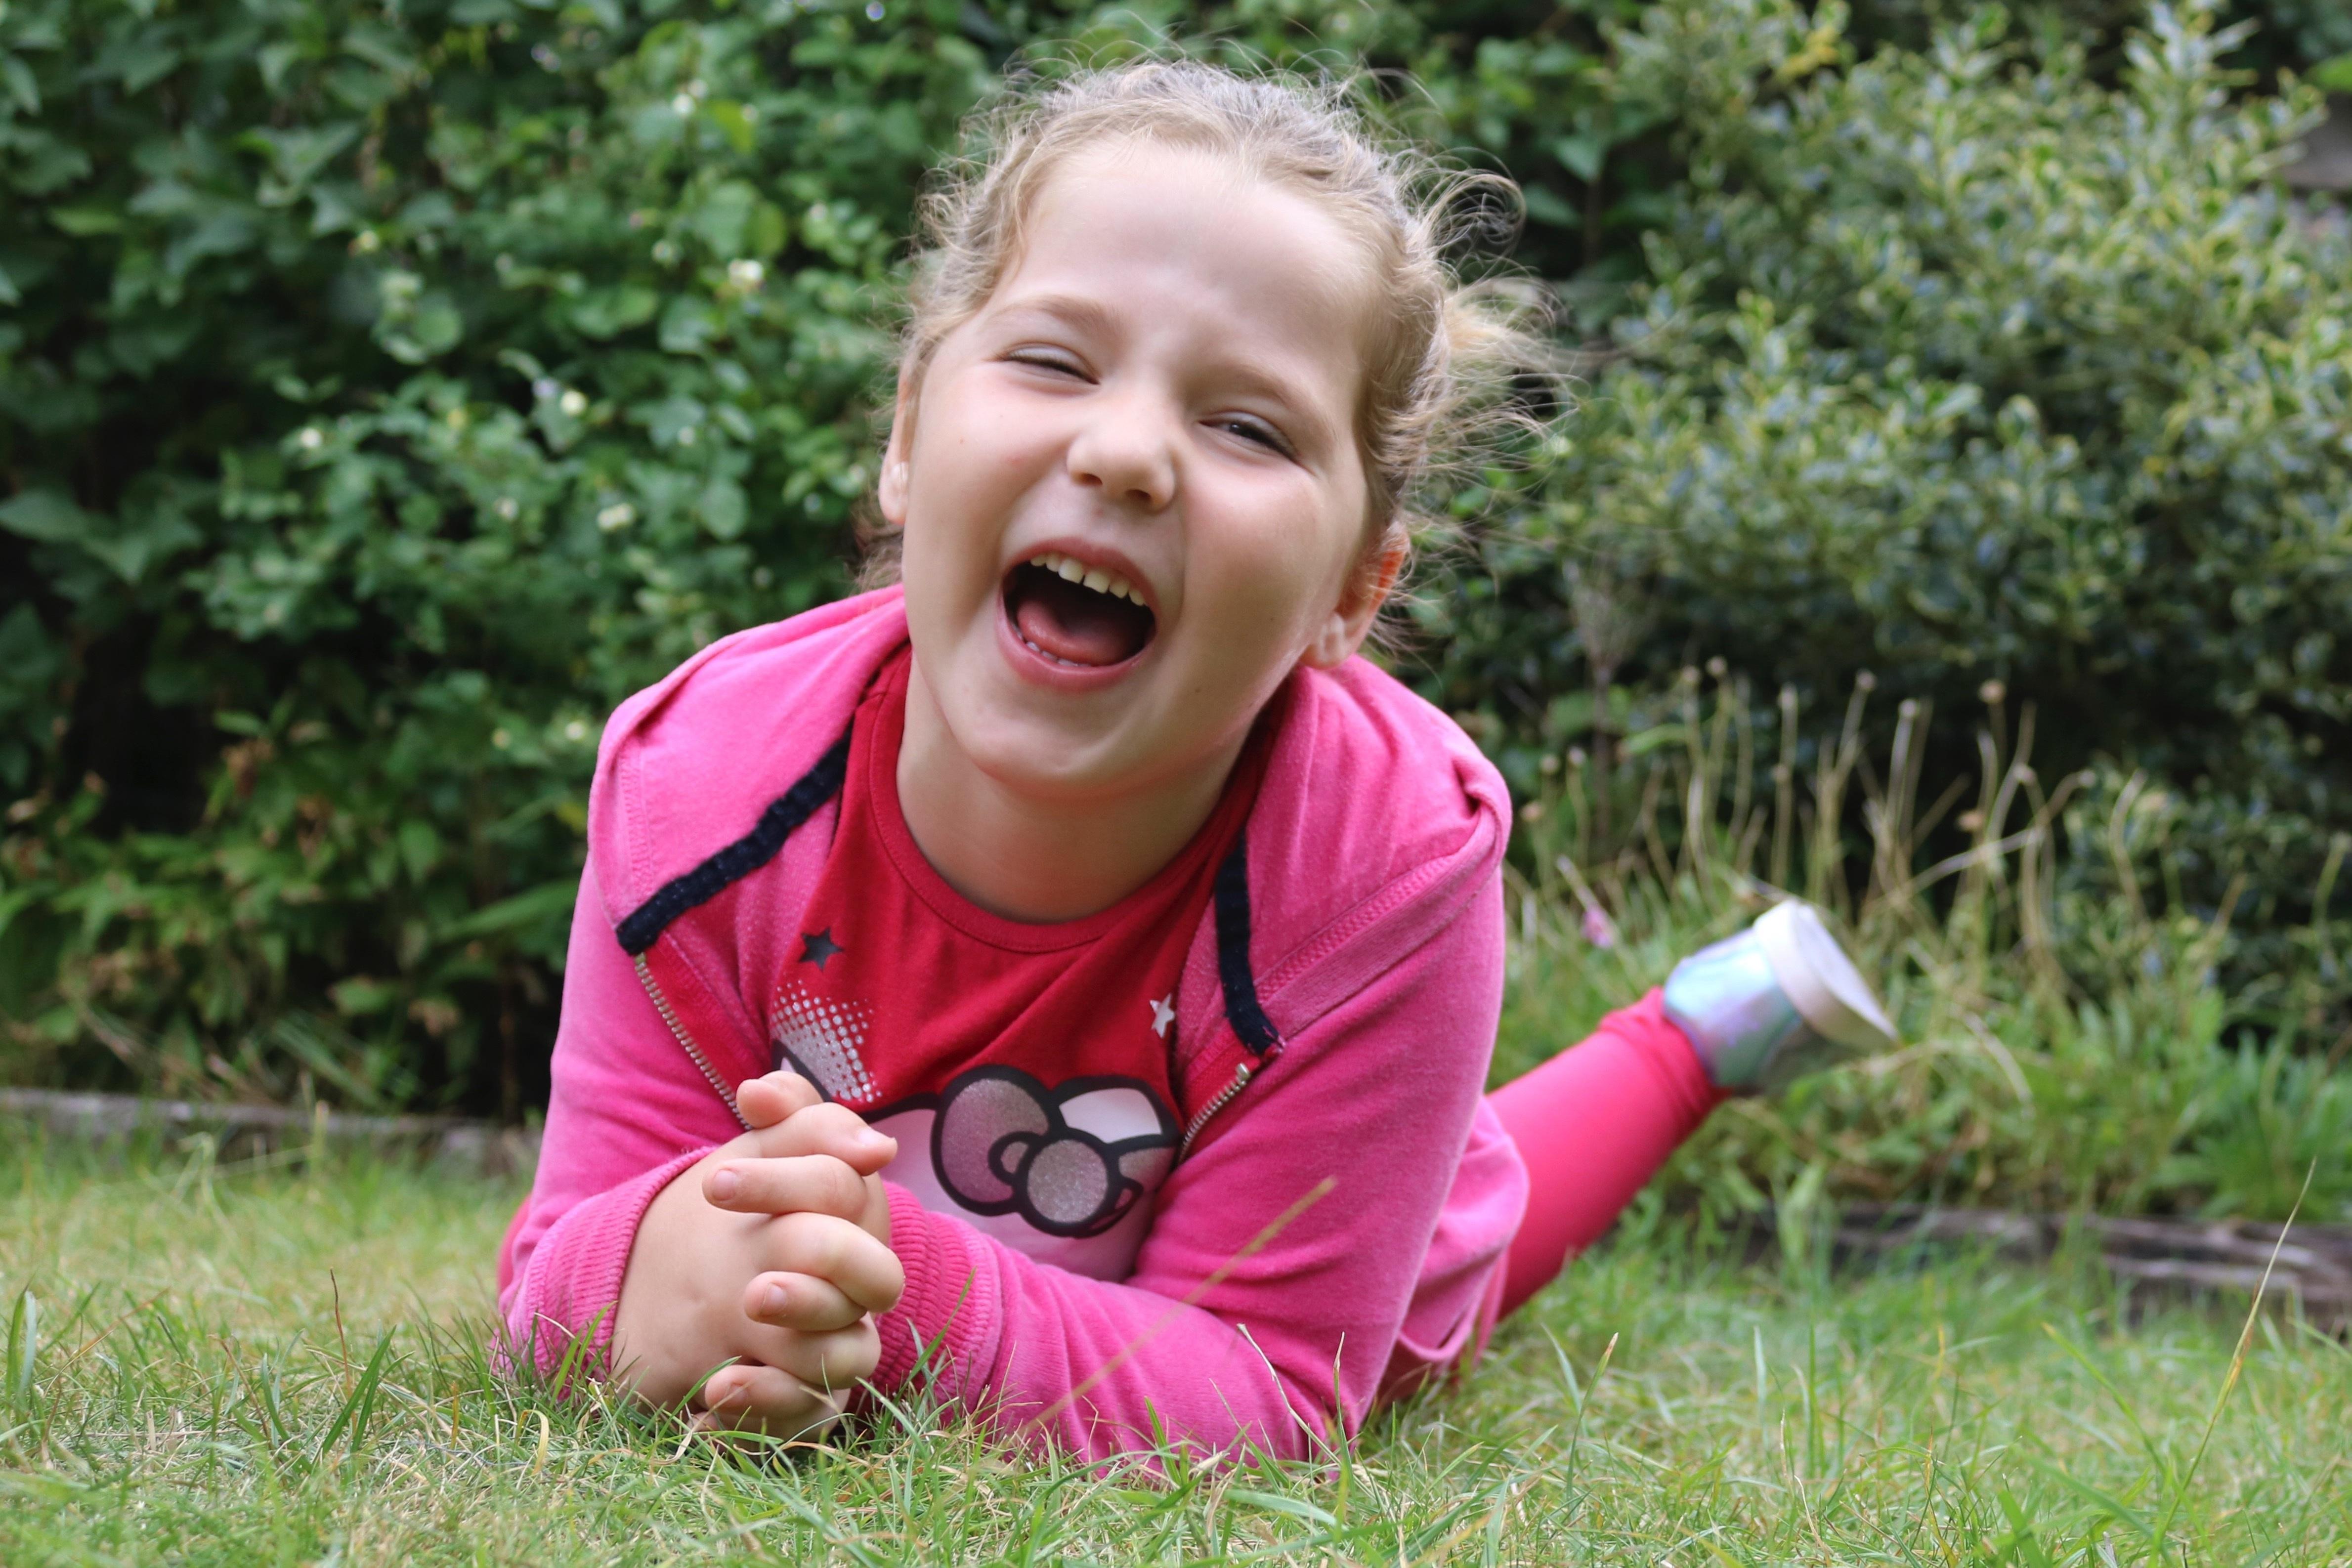 A plant that makes children happy 67